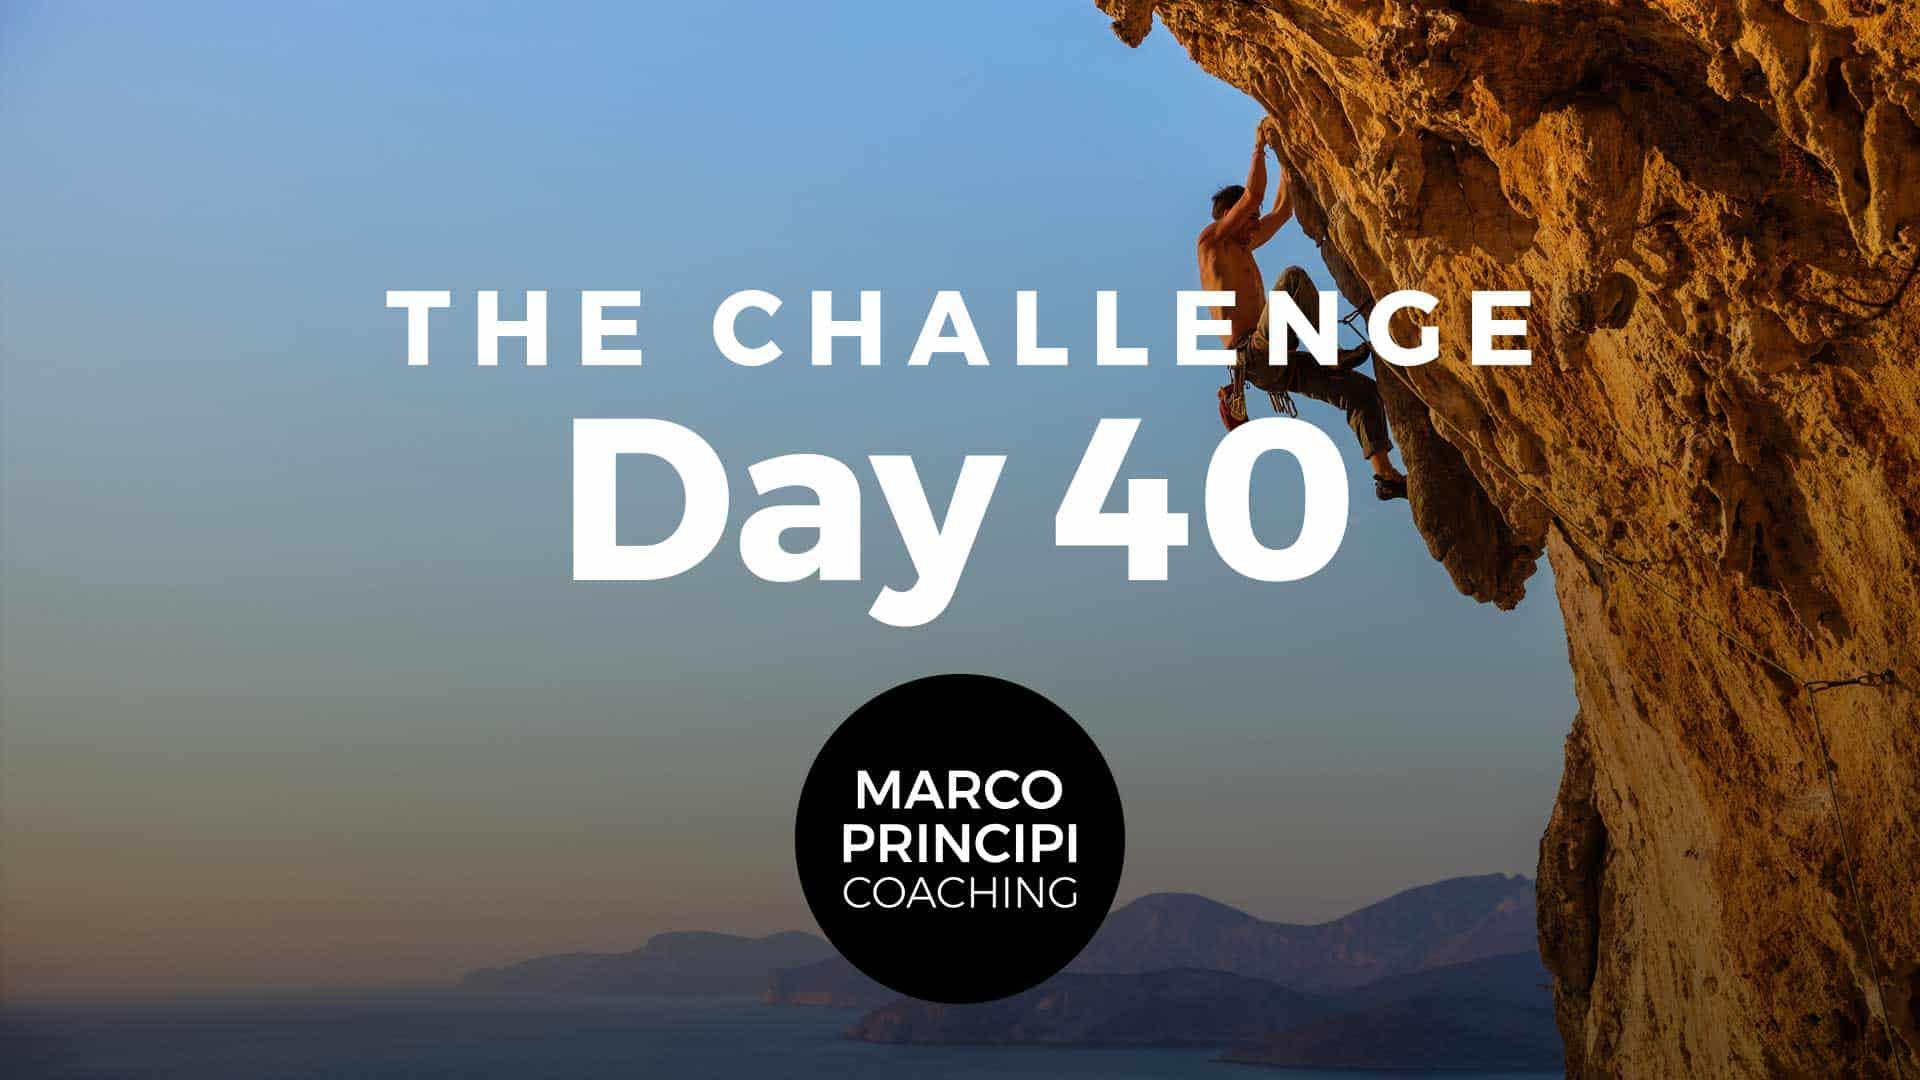 Marco Principi The Challenge Day 40